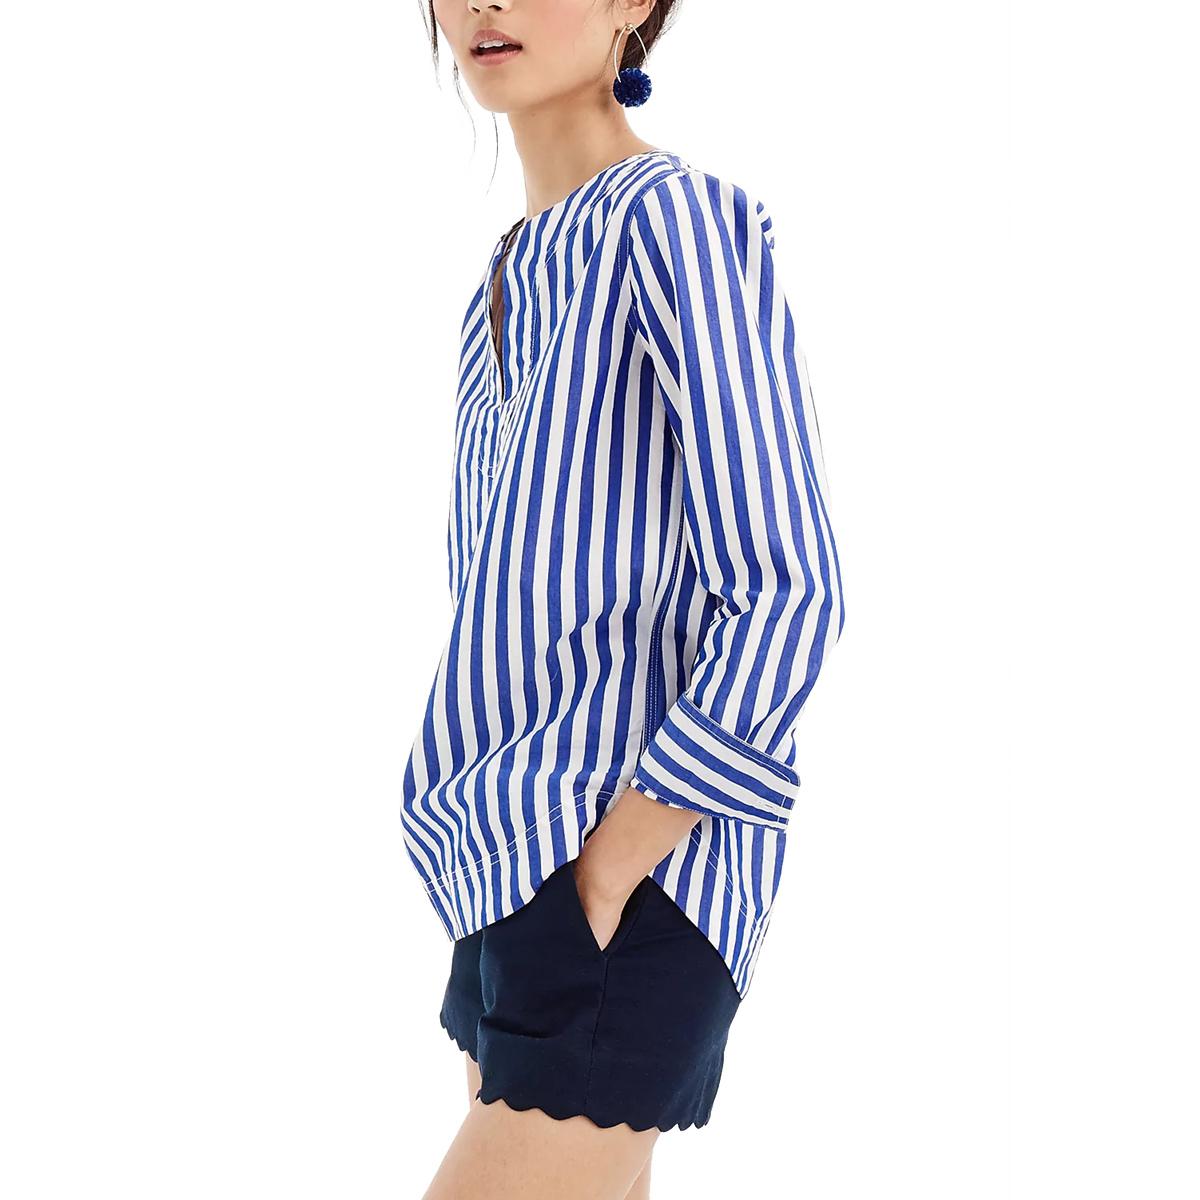 jcrew striped tunic top.jpg